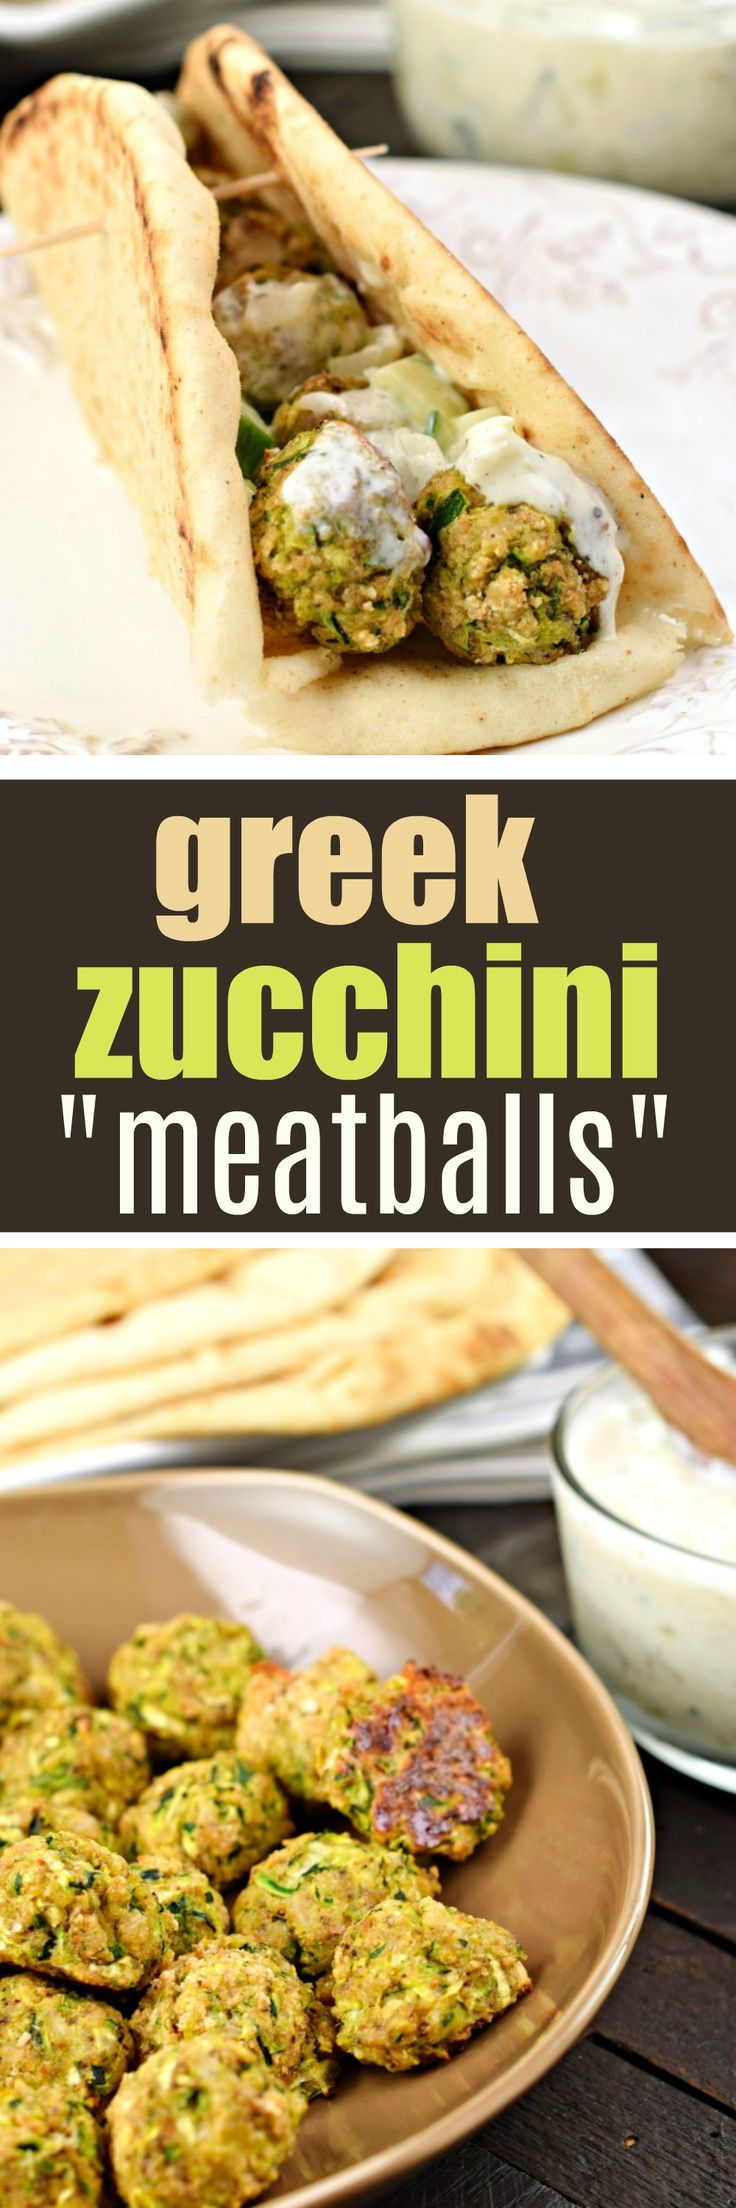 Greek Zucchini Meatballs #healthy #vegetarian #meatless #zucchini #greek #recipe #tzatziki #healthyrecipes